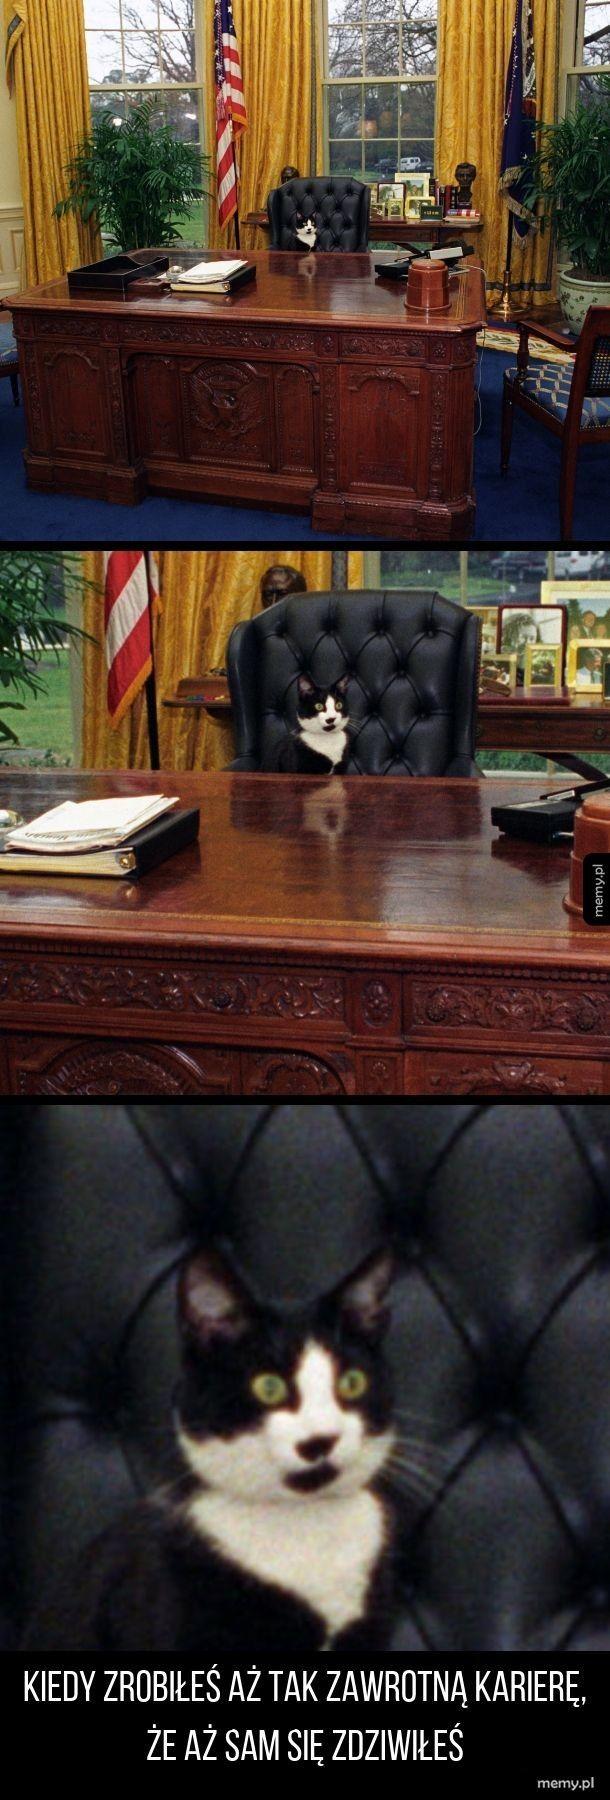 Koteł na prezydenta!